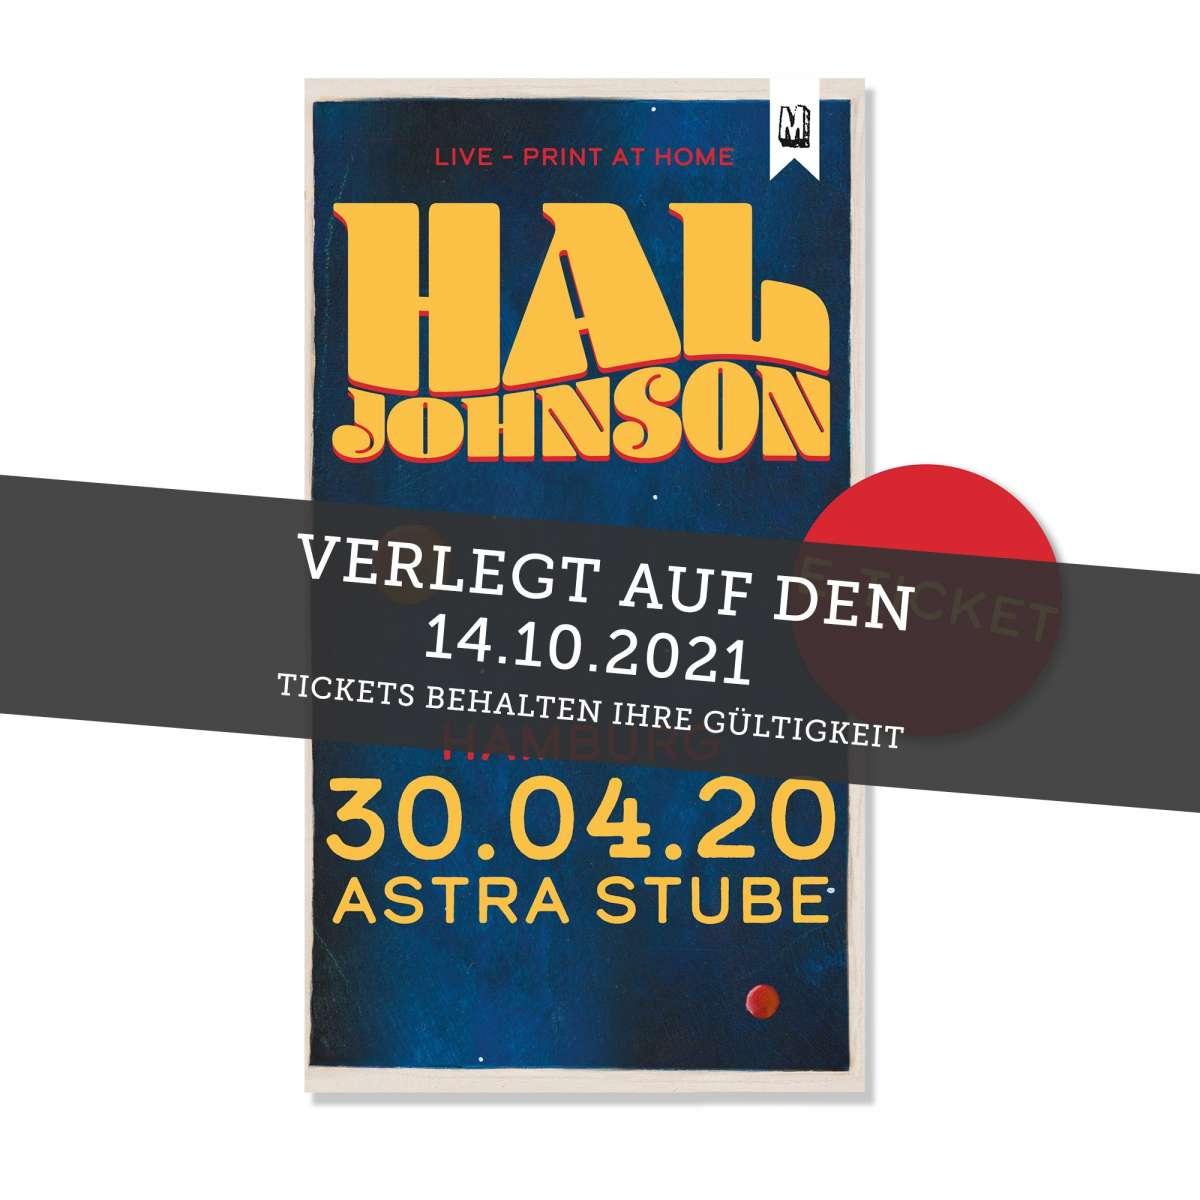 Print@Home Ticket - Hal Johnson - Hamburg 14.10.2021 ...